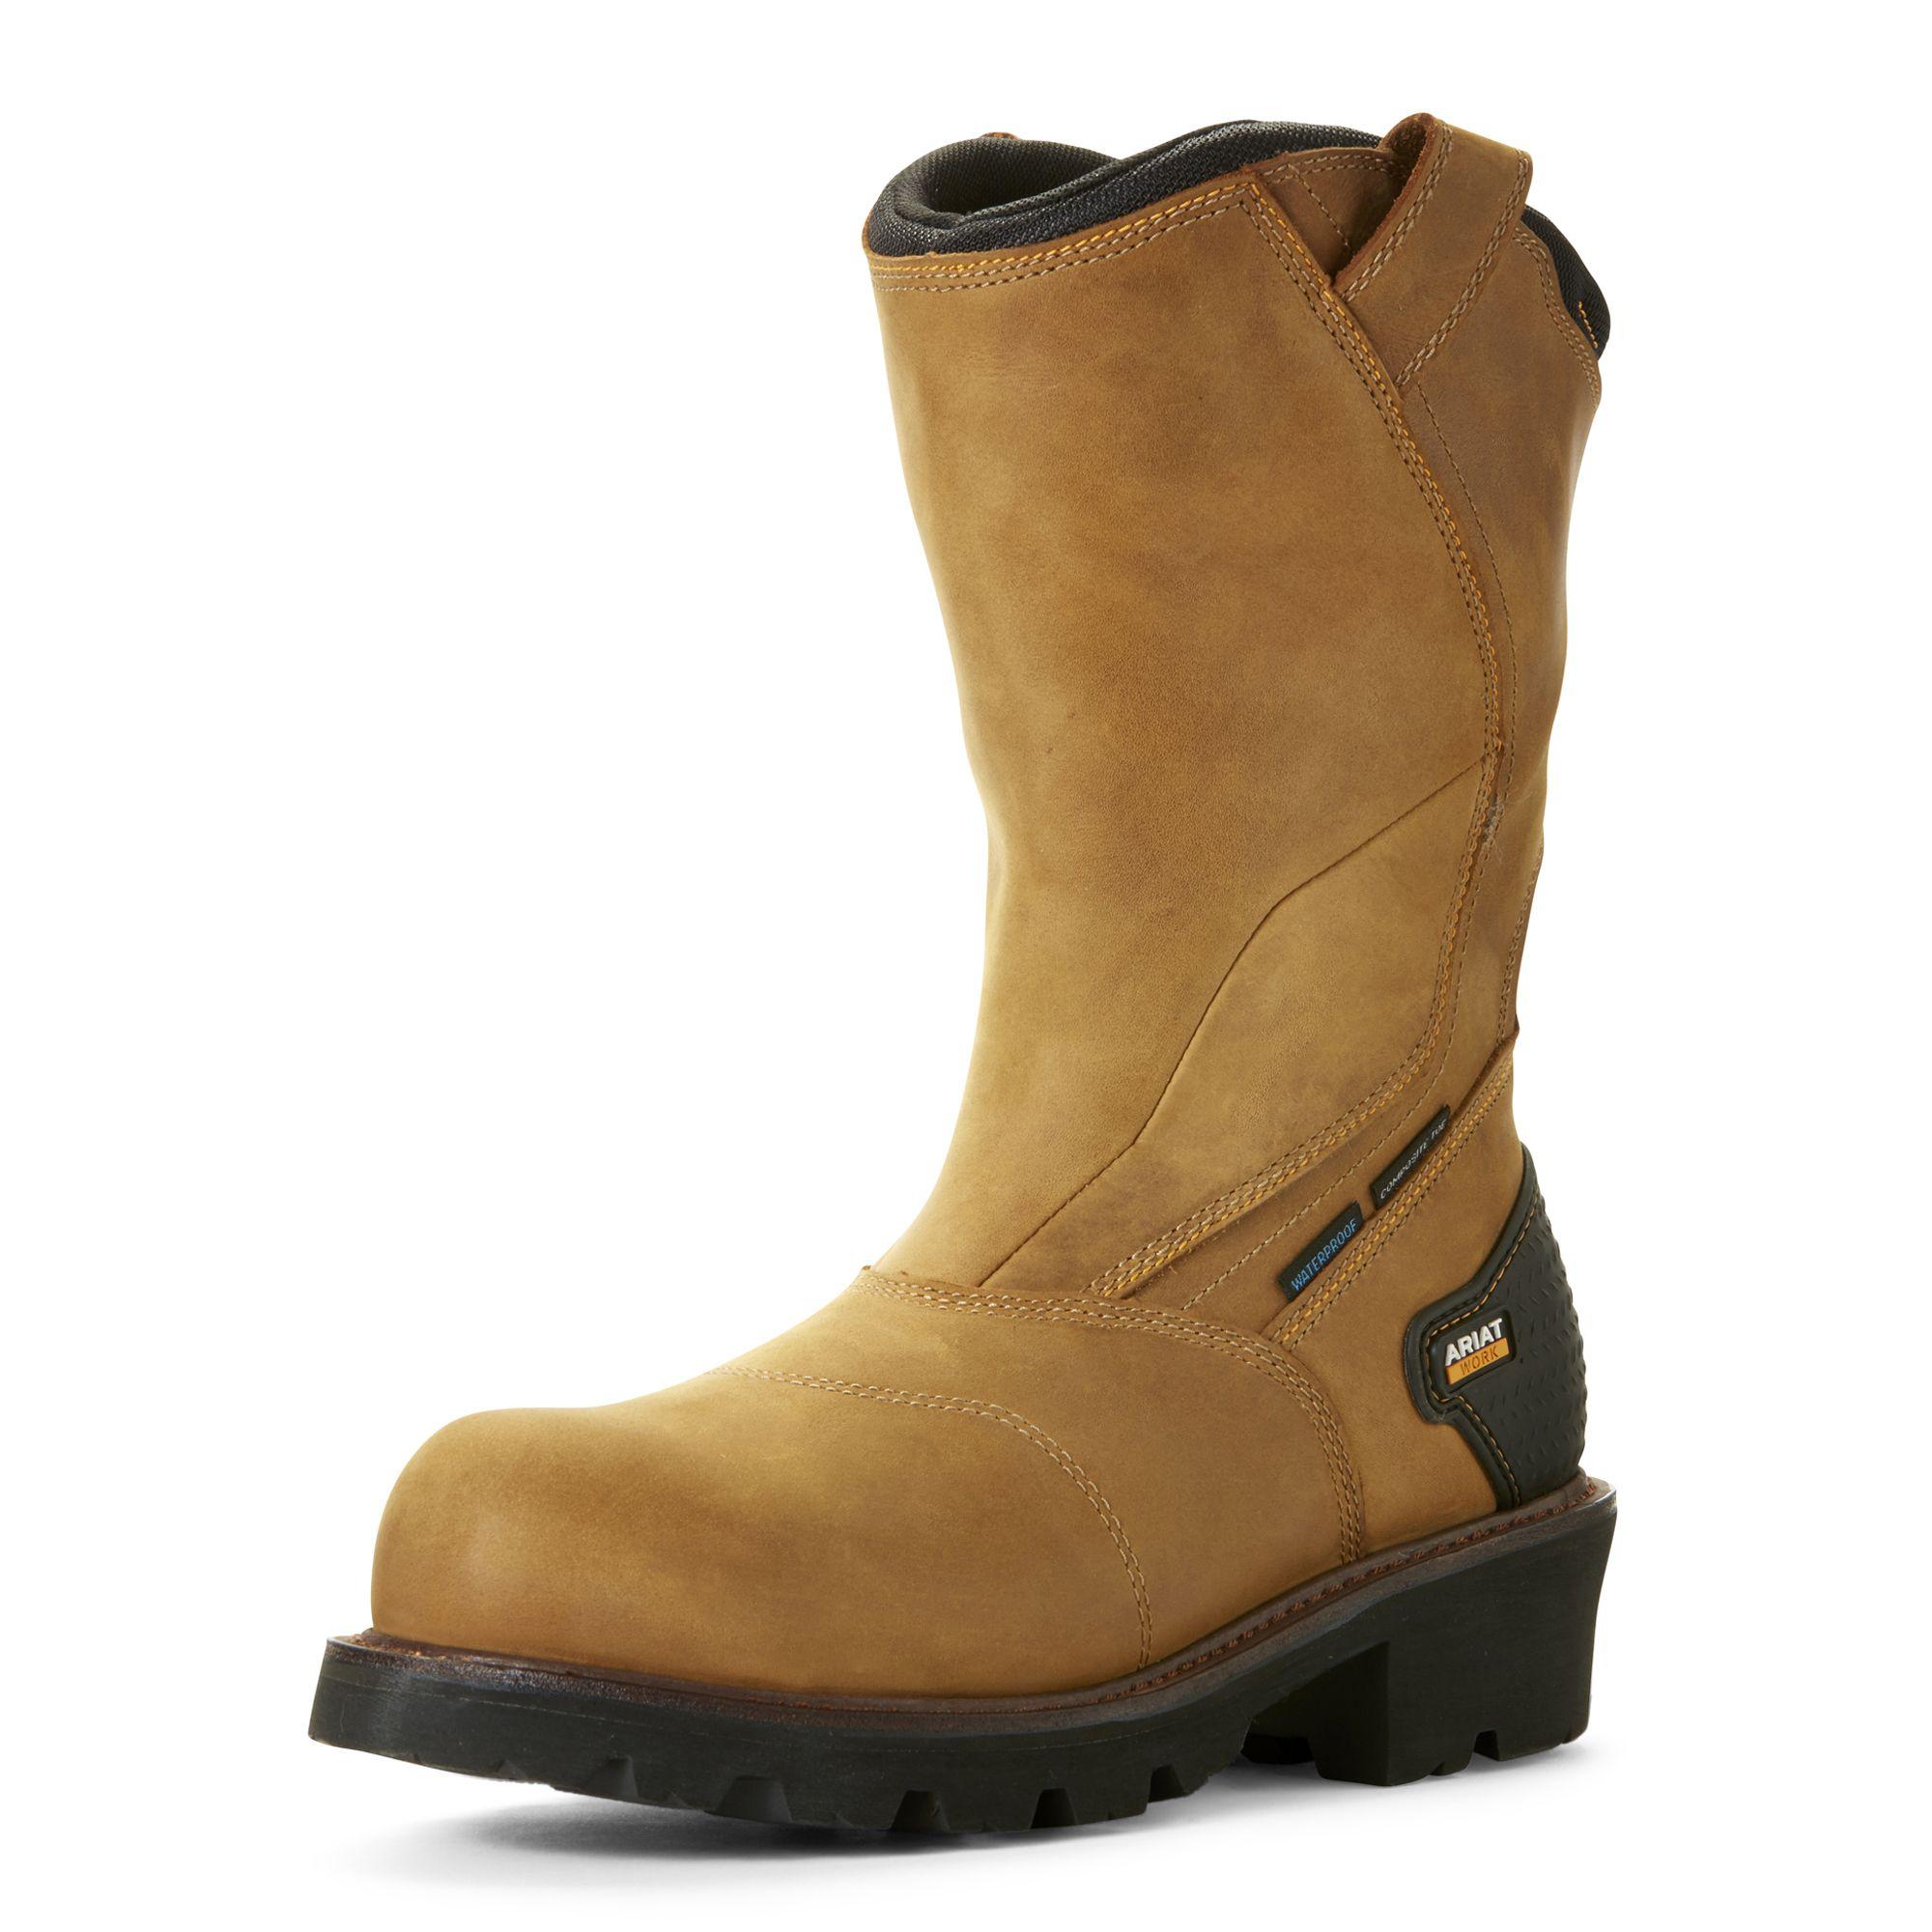 Powerline Waterproof Composite Toe Work Boot Composite Toe Work Boots Boots Leather